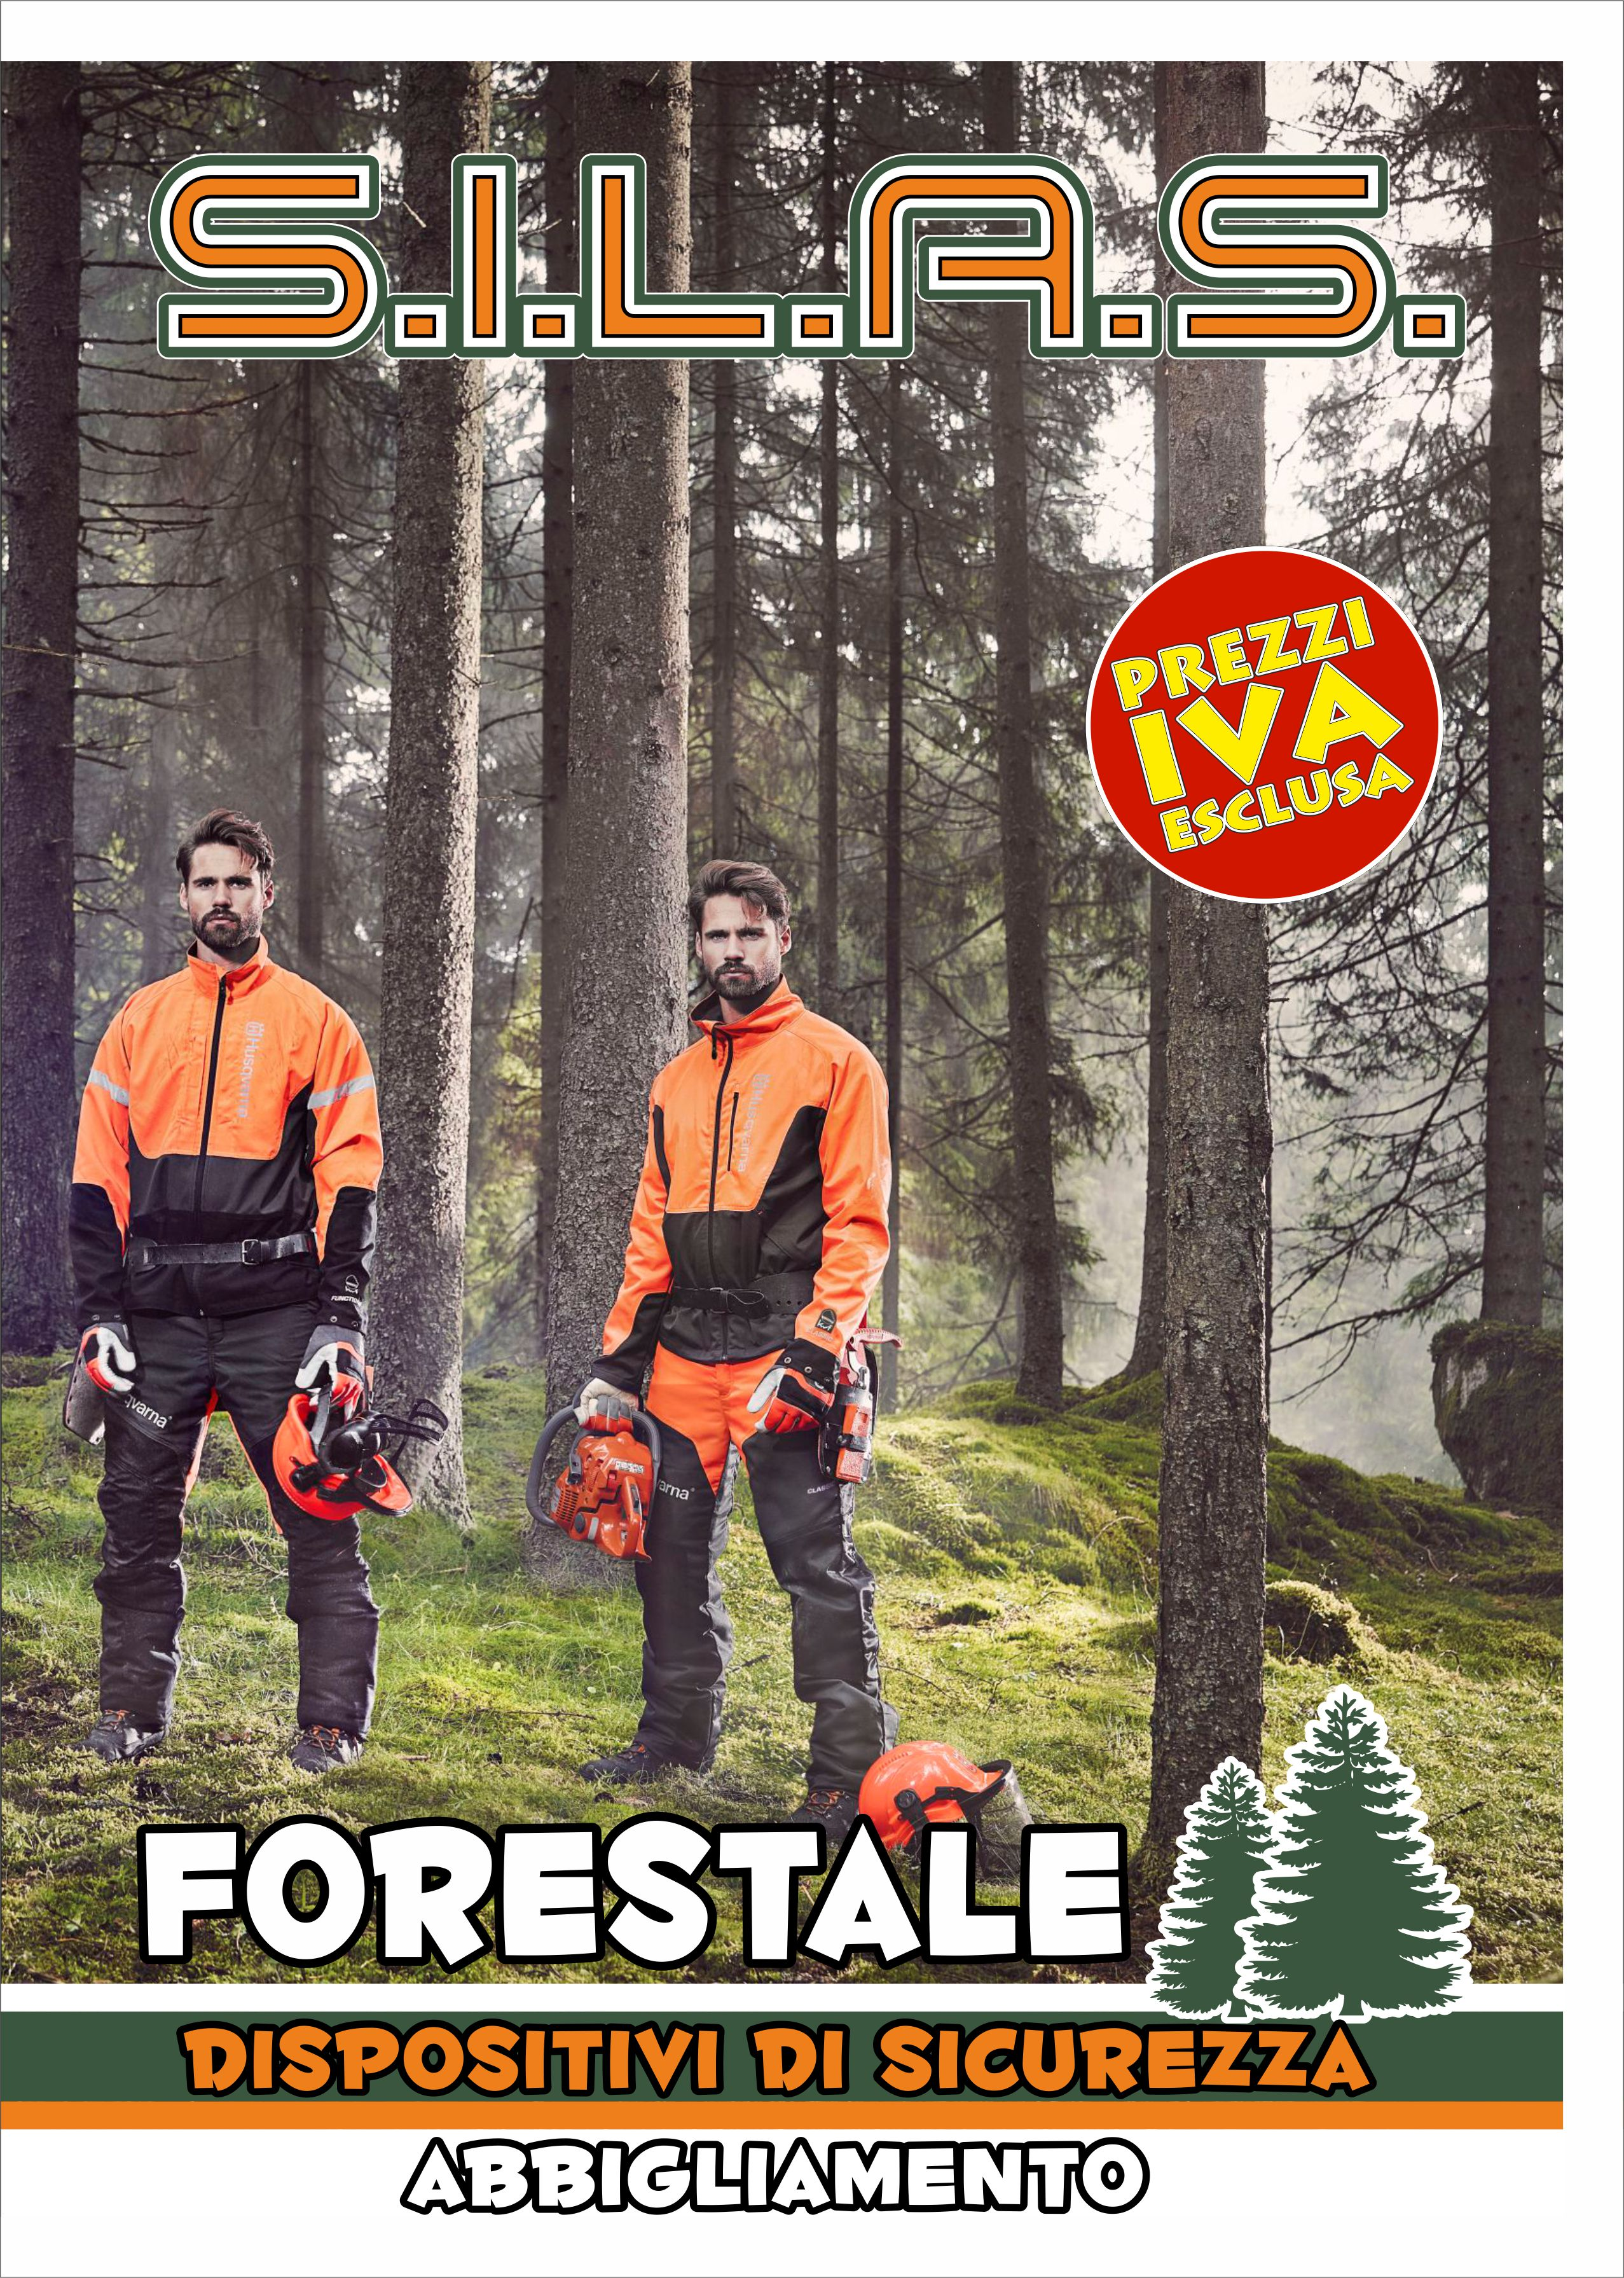 Copertina forestale